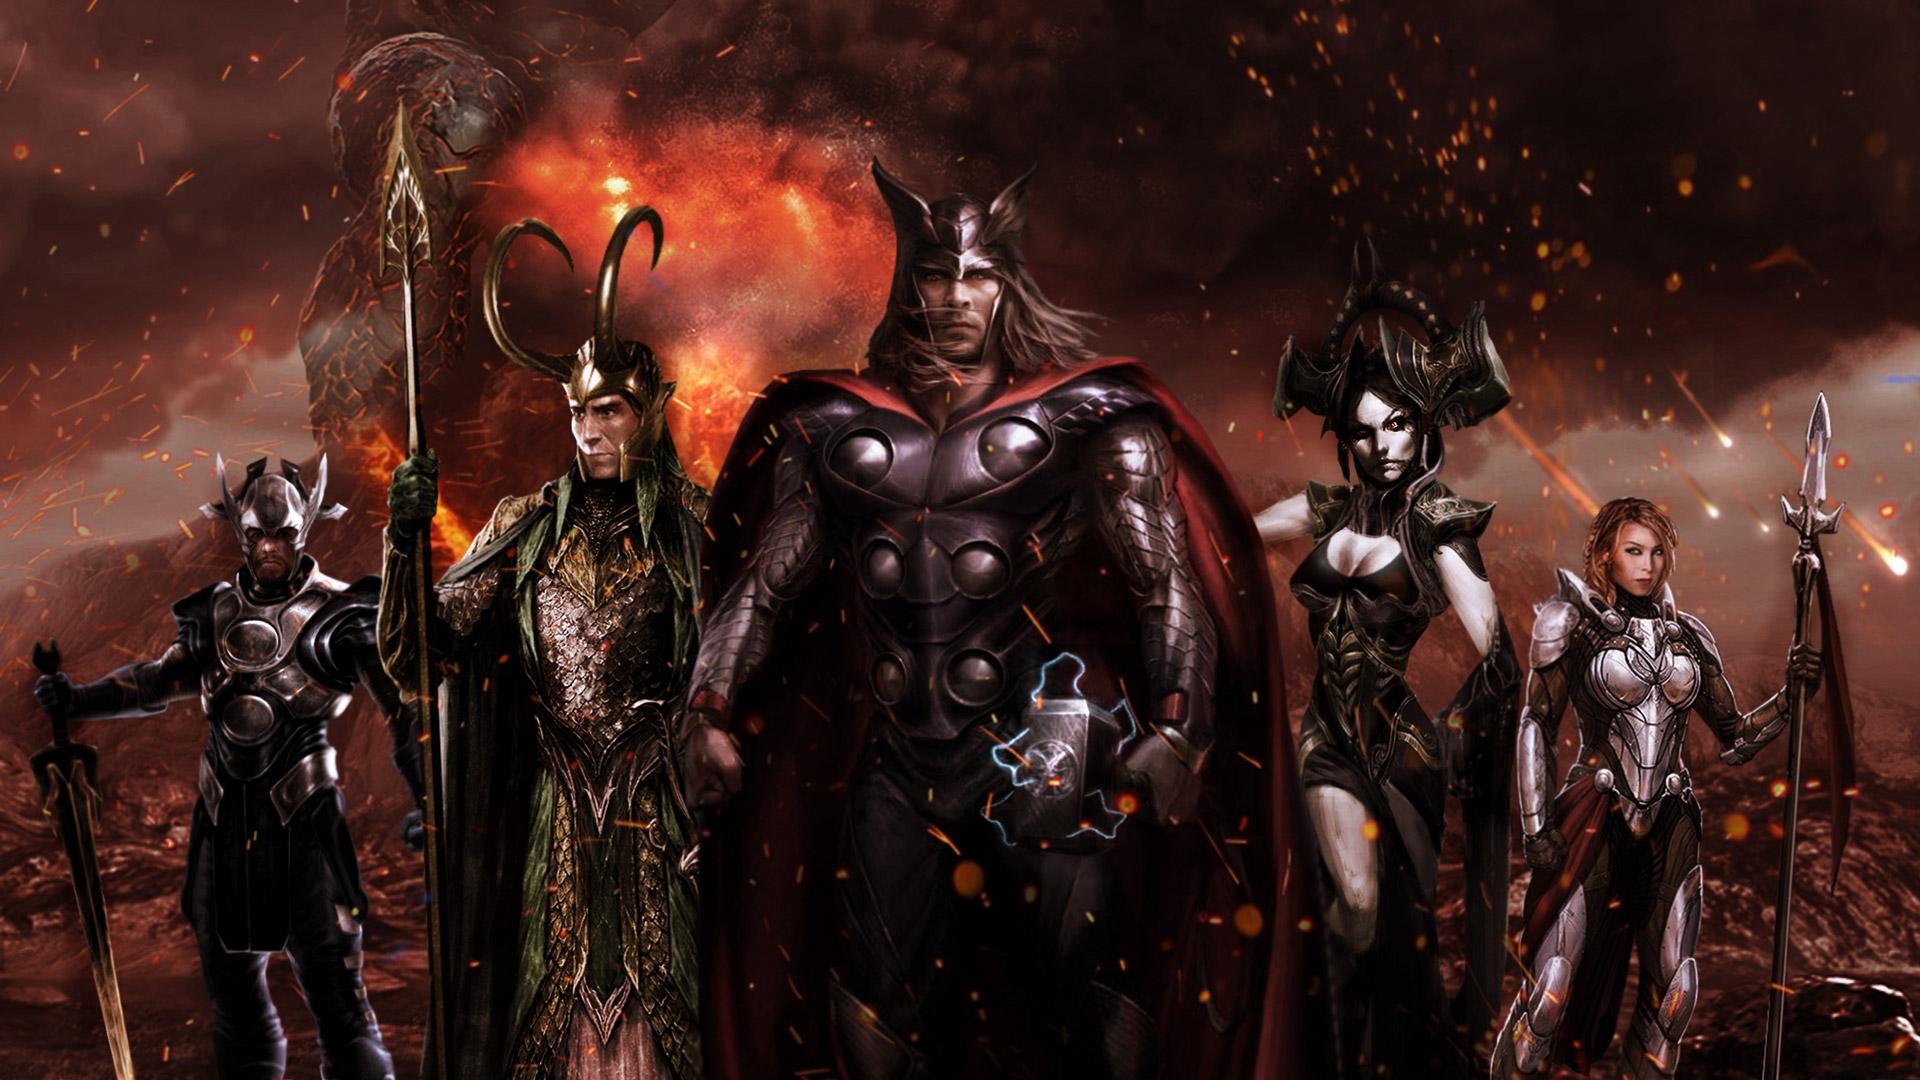 Thor ragnarok fan poster hd movies 4k wallpapers images - Thor ragnarok wallpaper 4k ...